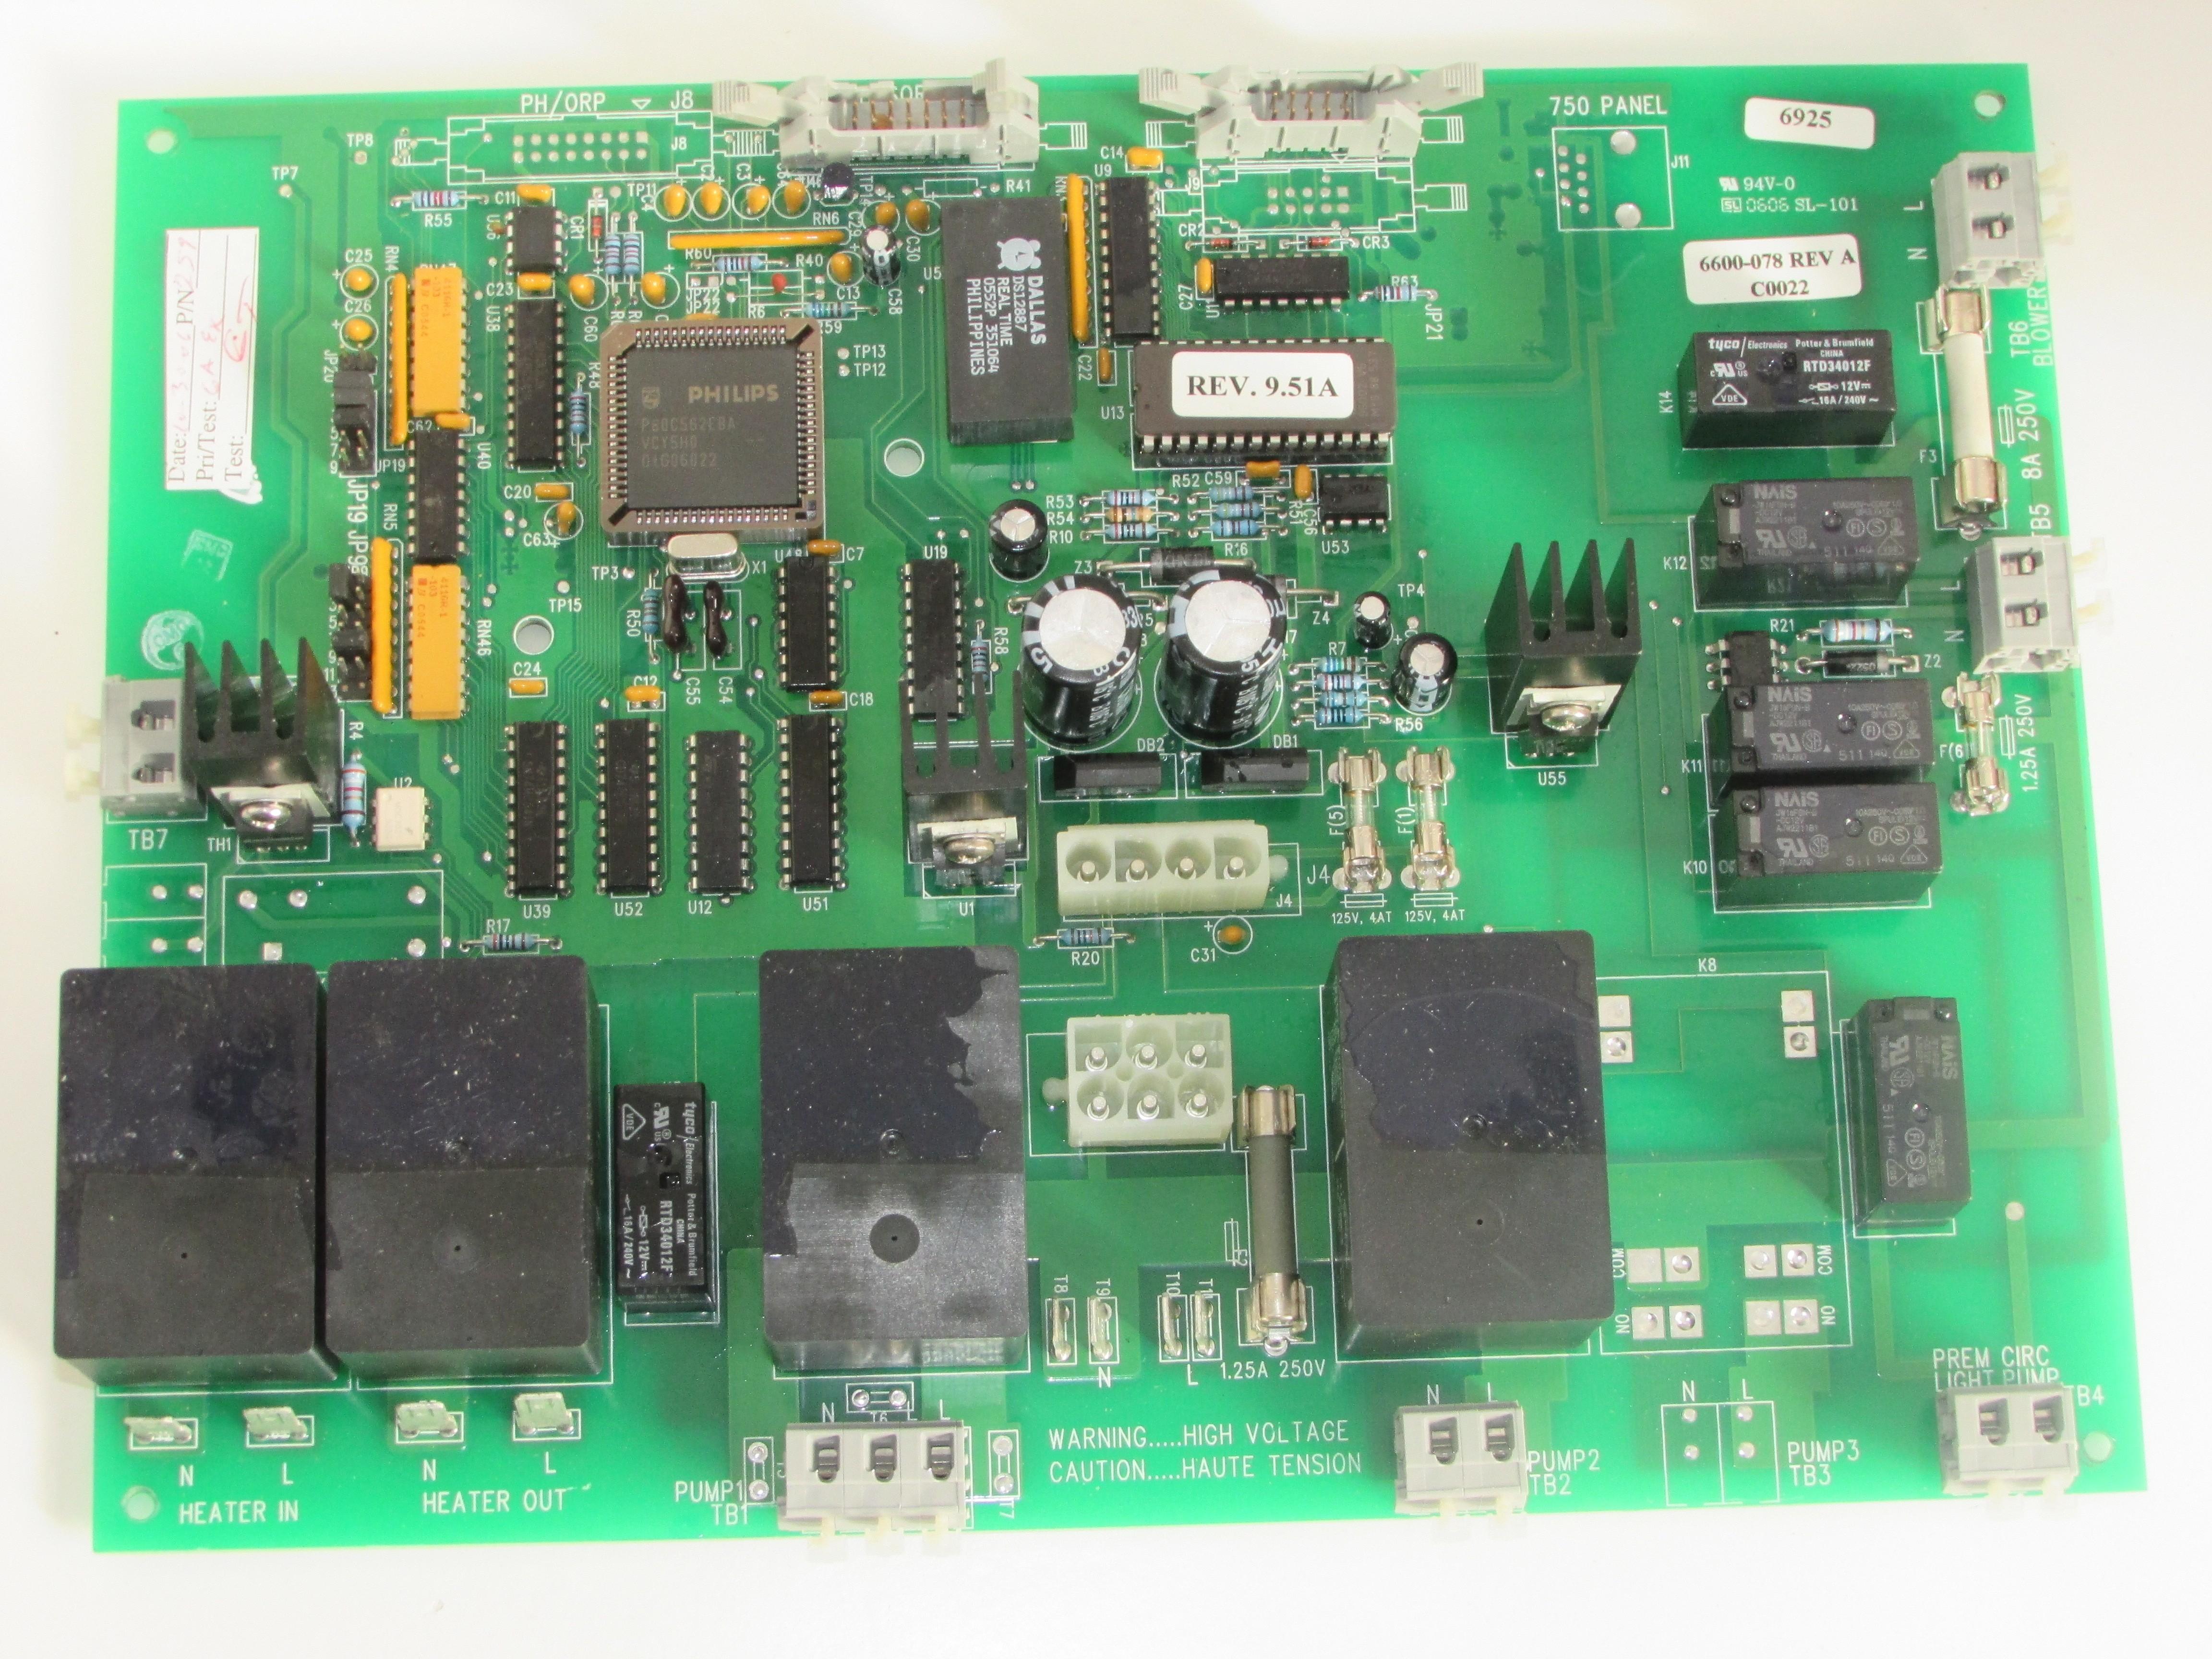 Circuito Impreso : Placa de circuito impreso jacuzzi j bombas lcd parte n